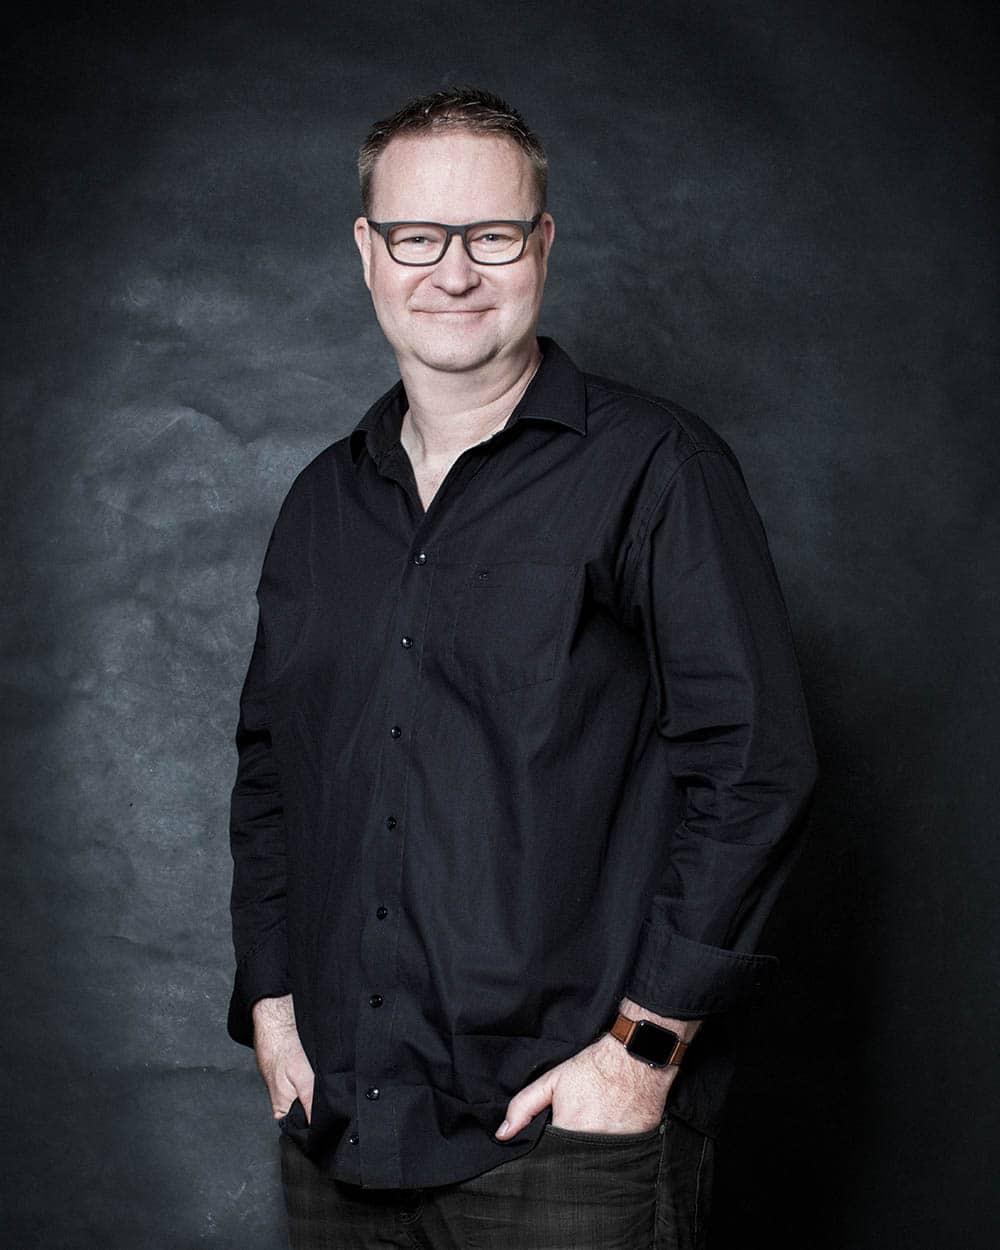 Grafikdesigner Osnabrück /// Der Osnabrücker WordPress-Experte Detlef Heese